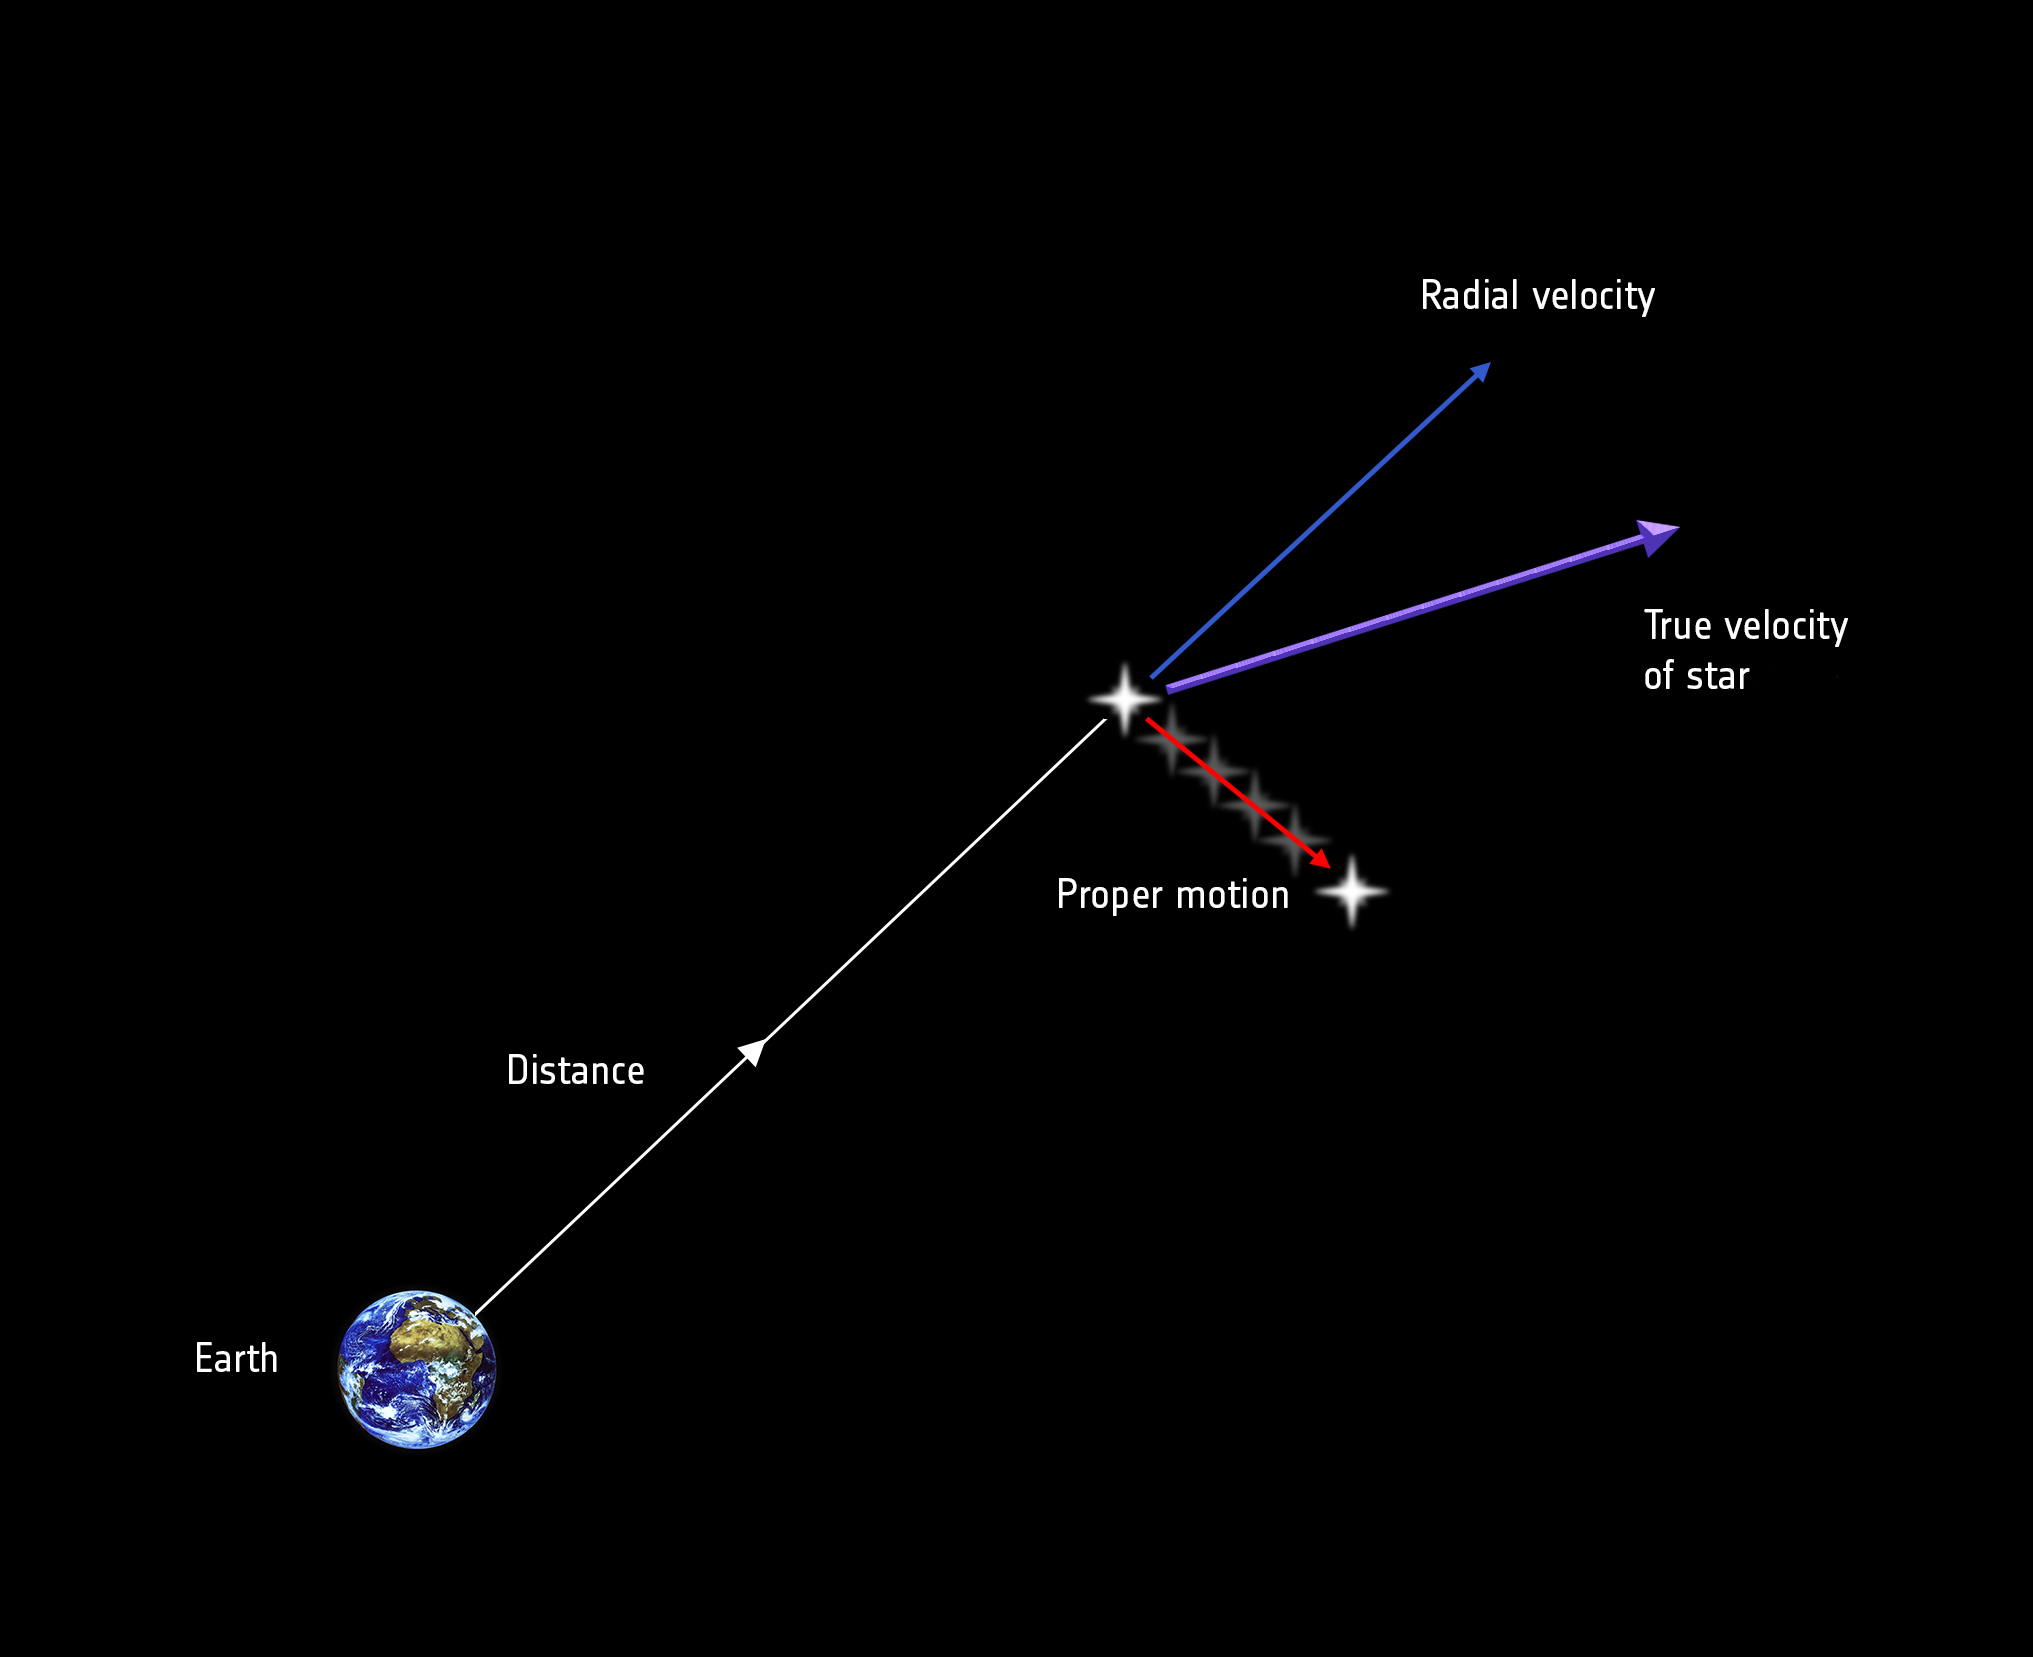 ESA Science & Technology: Stellar motion